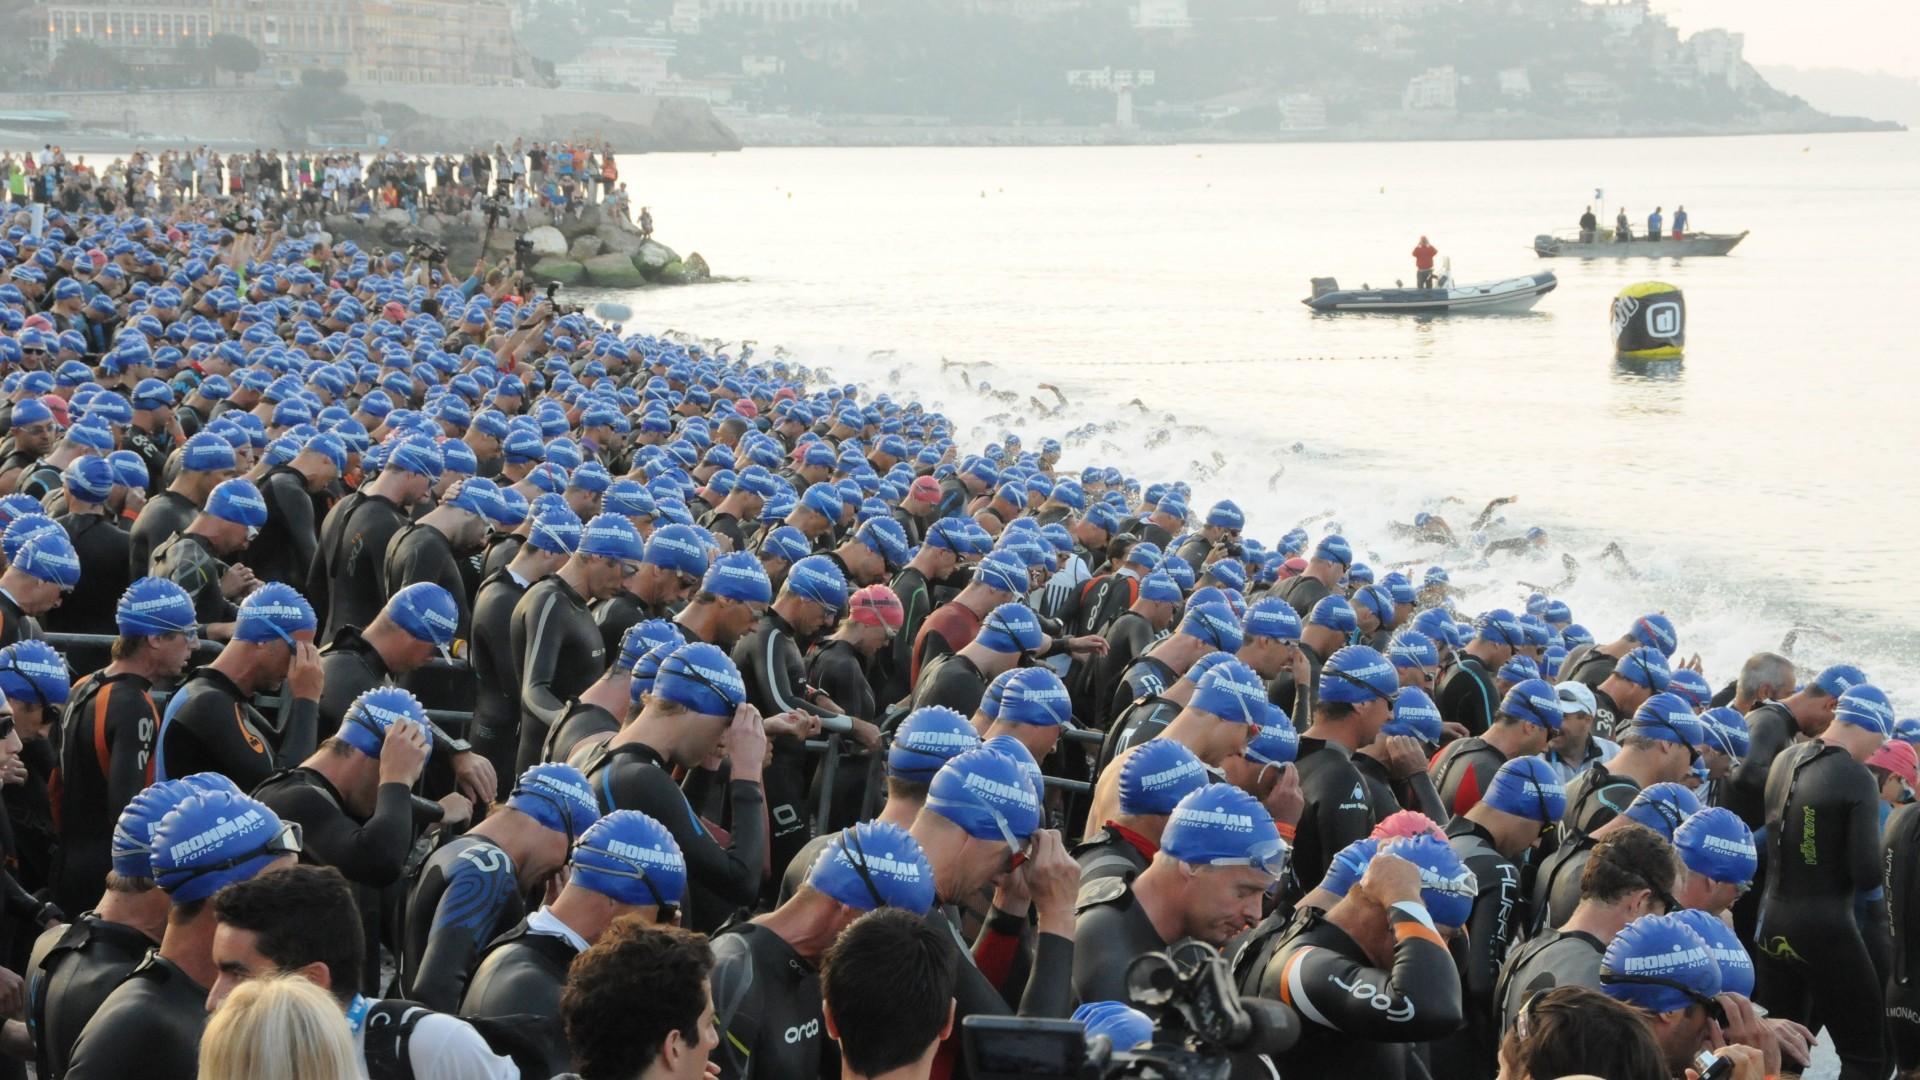 france_triathlon_promenade_des_anglais_1920x1080_70014.jpg